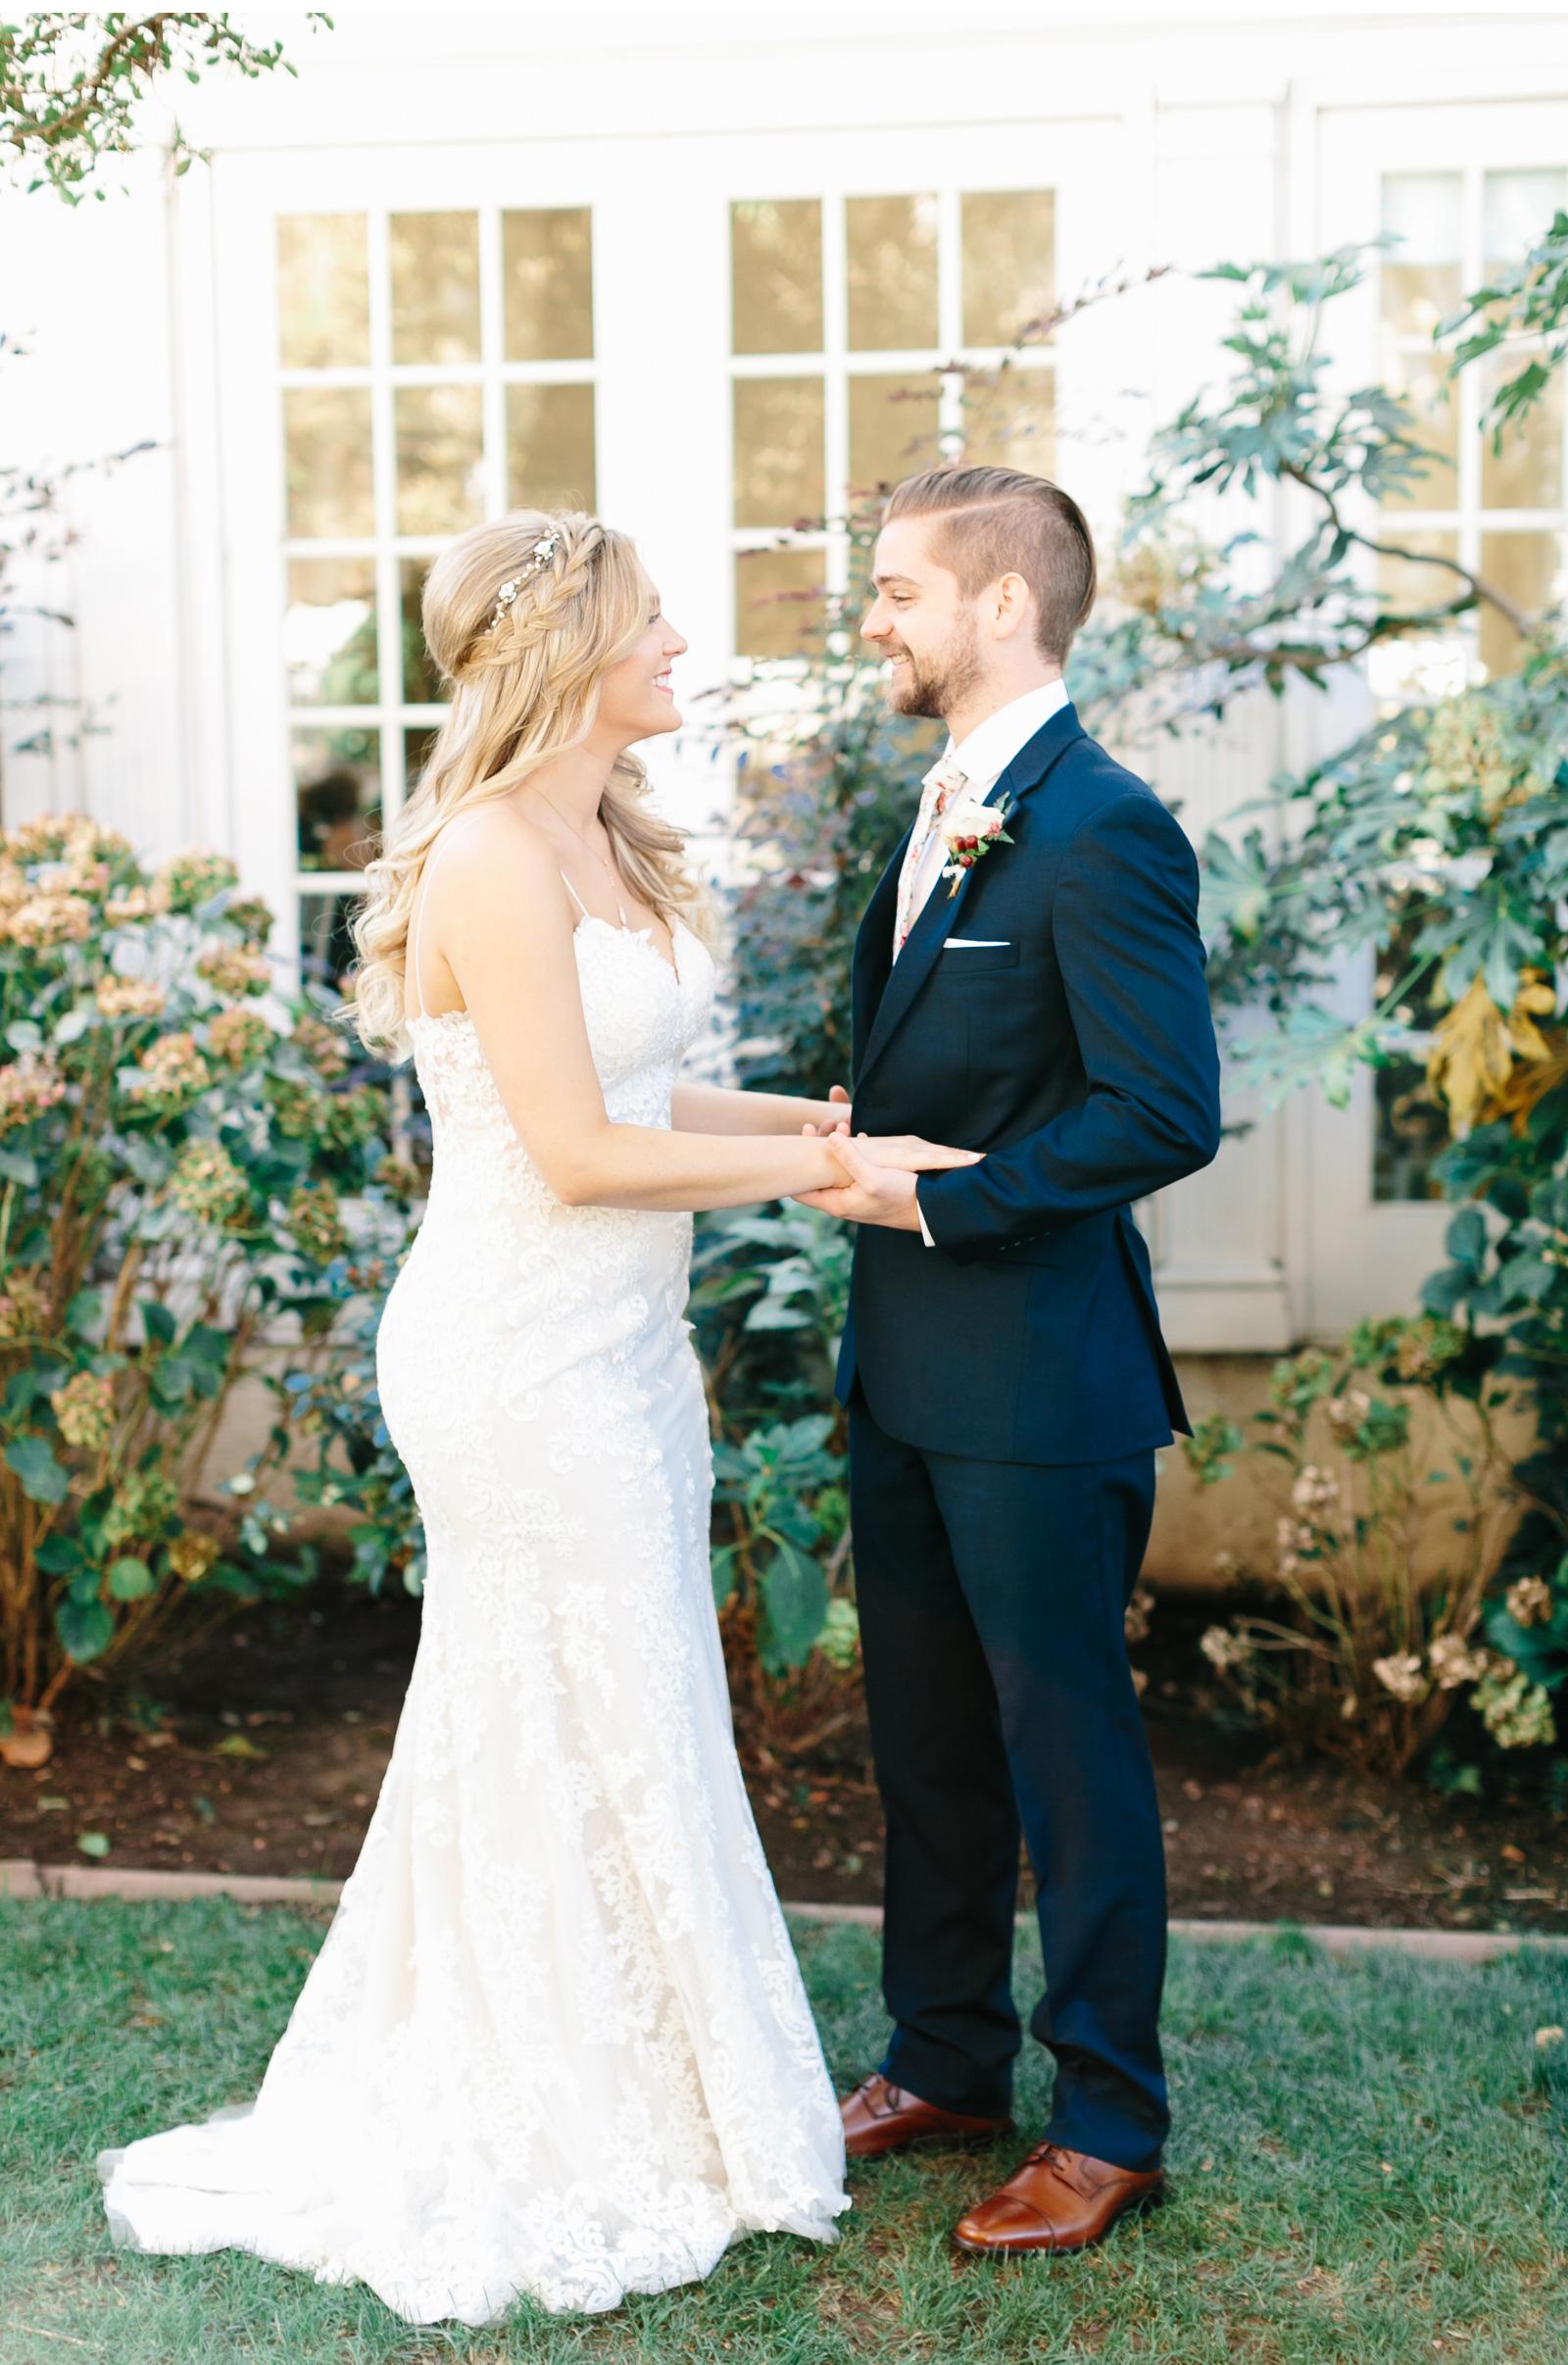 Malibu-Wedding-Photographer-Natalie-Schutt-Photography-Vizcaya_05.jpg